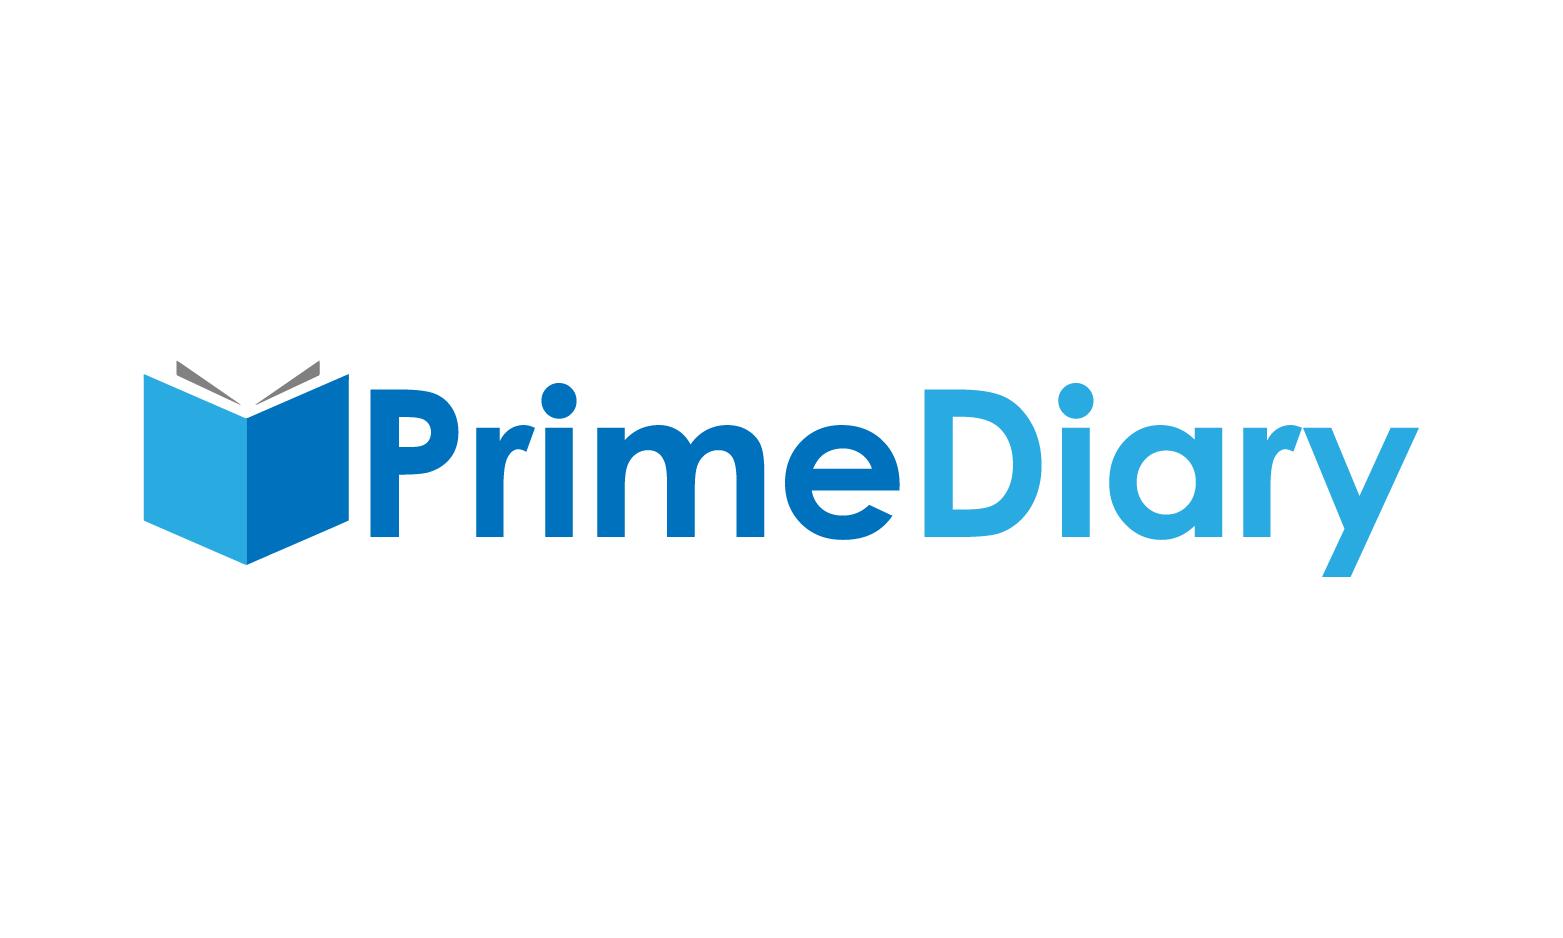 PrimeDiary.com